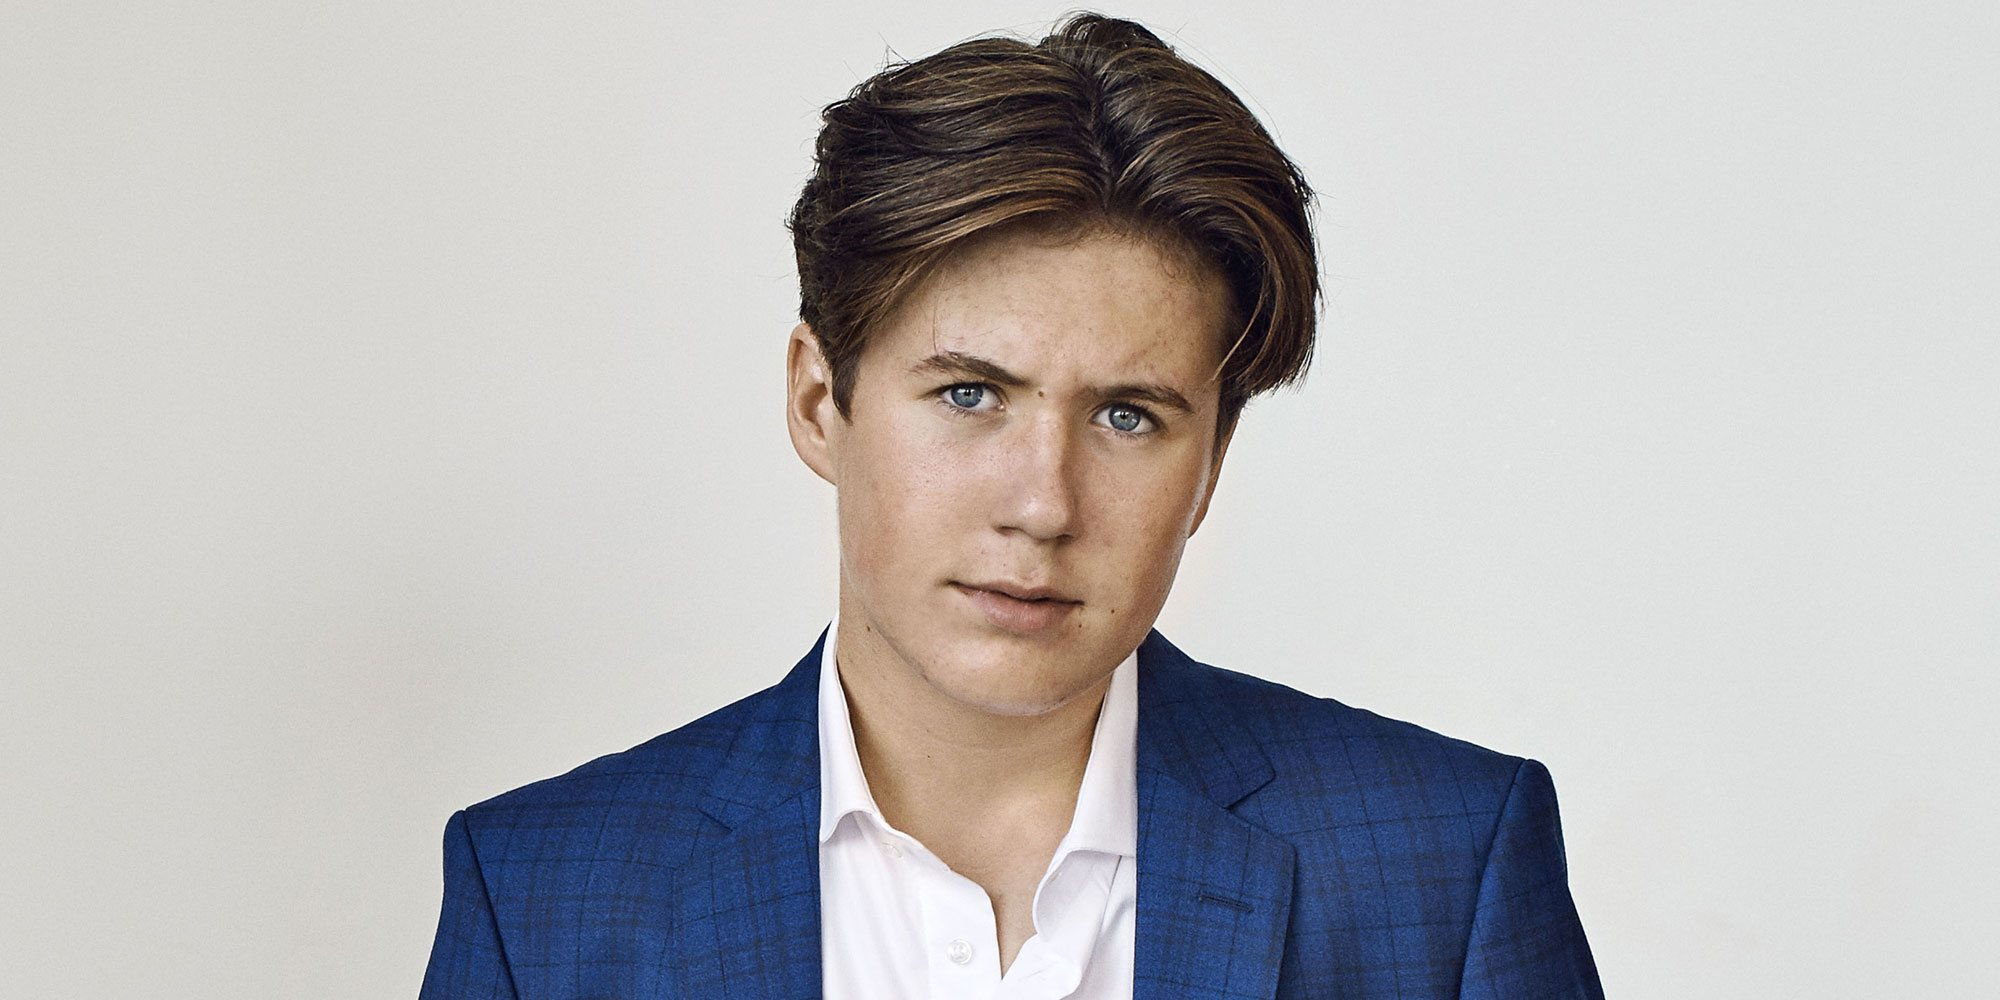 Christian de Dinamarca da positivo en coronavirus